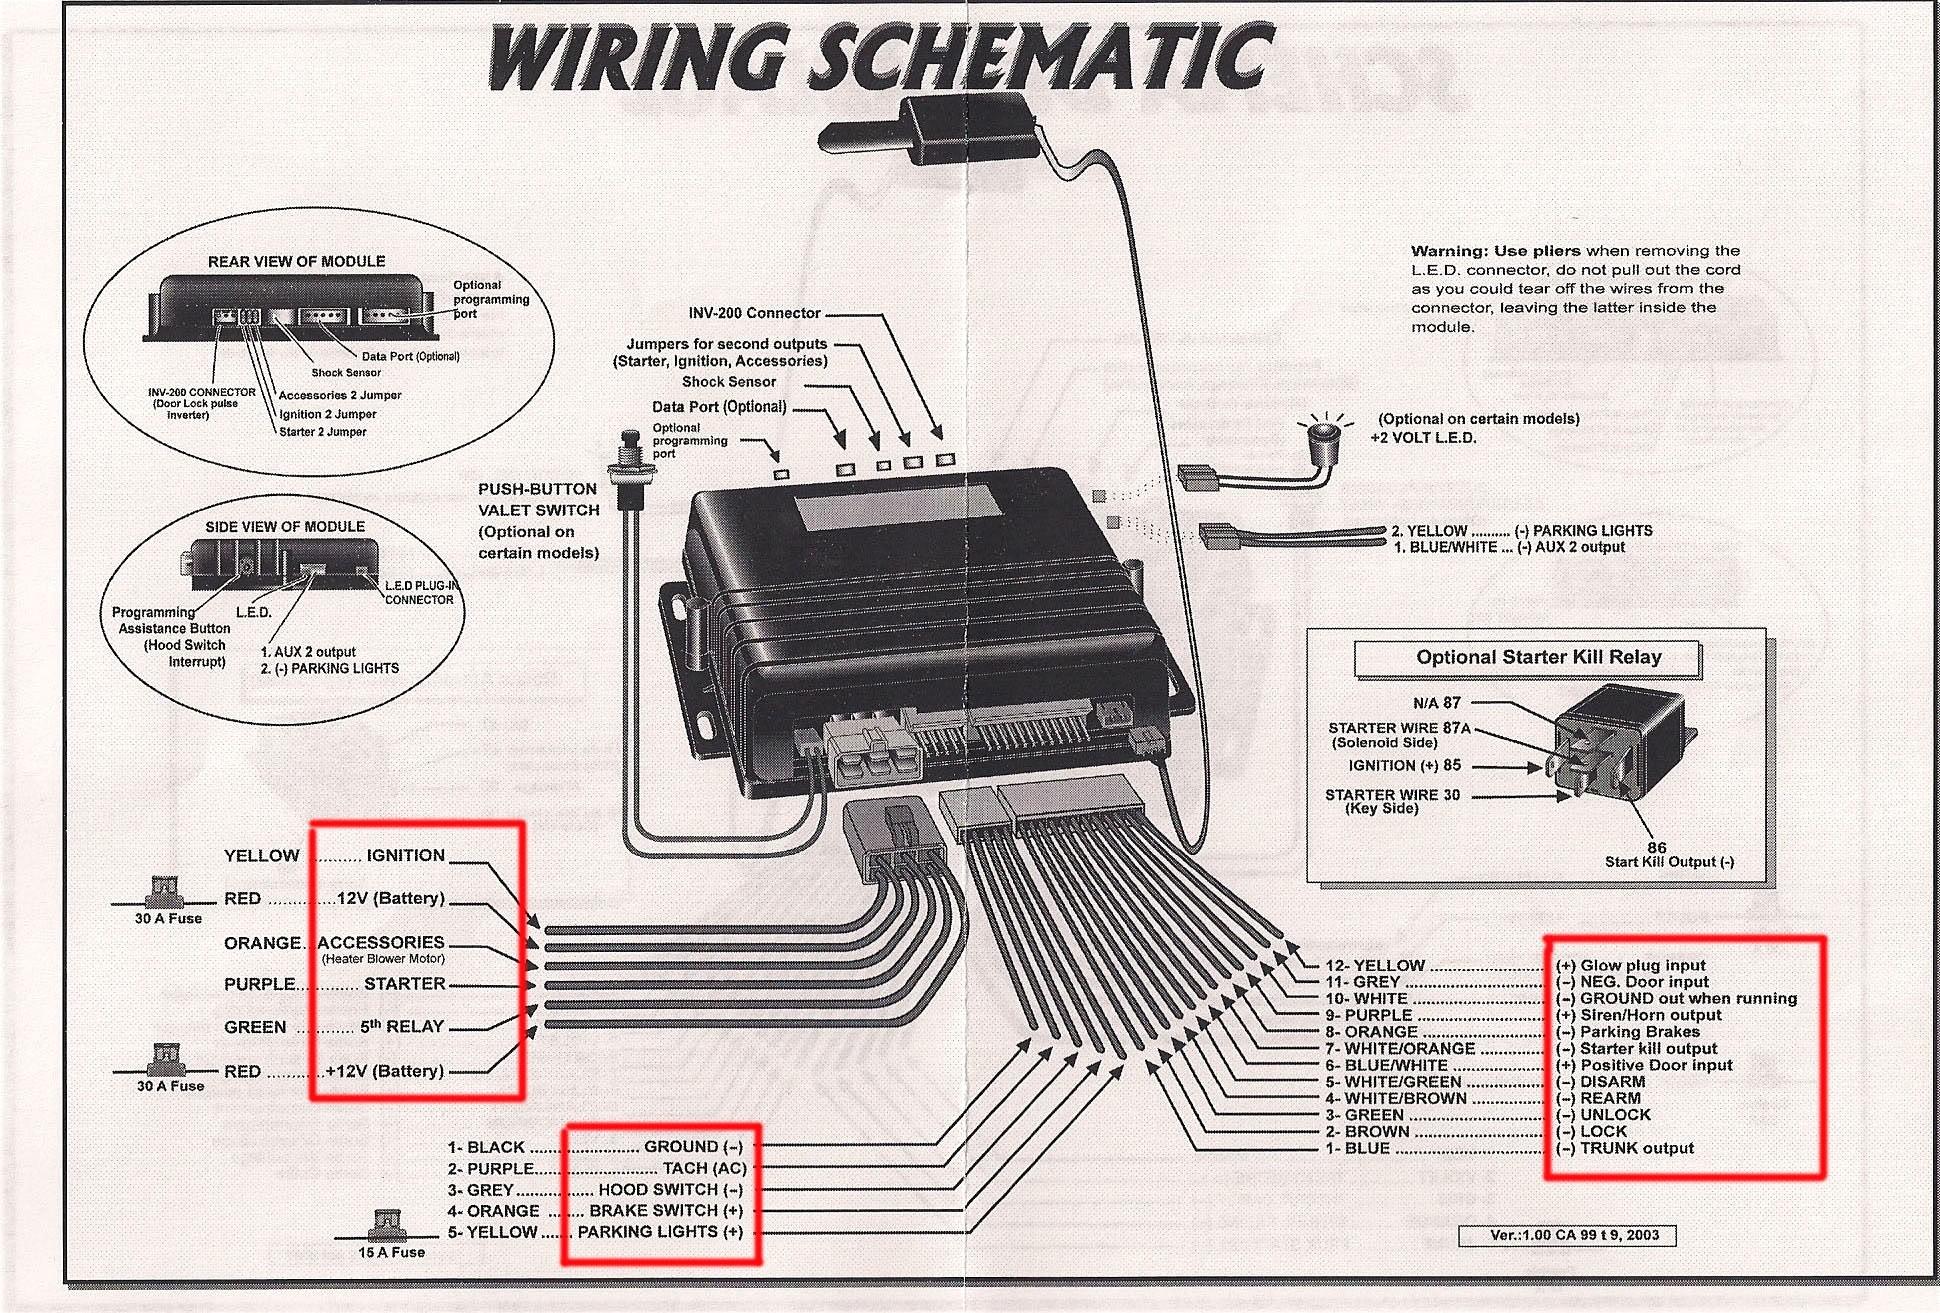 Car Alarm System Diagram Car Alarm Wiring Diagram Security Download Throughout Diagrams Of Car Alarm System Diagram